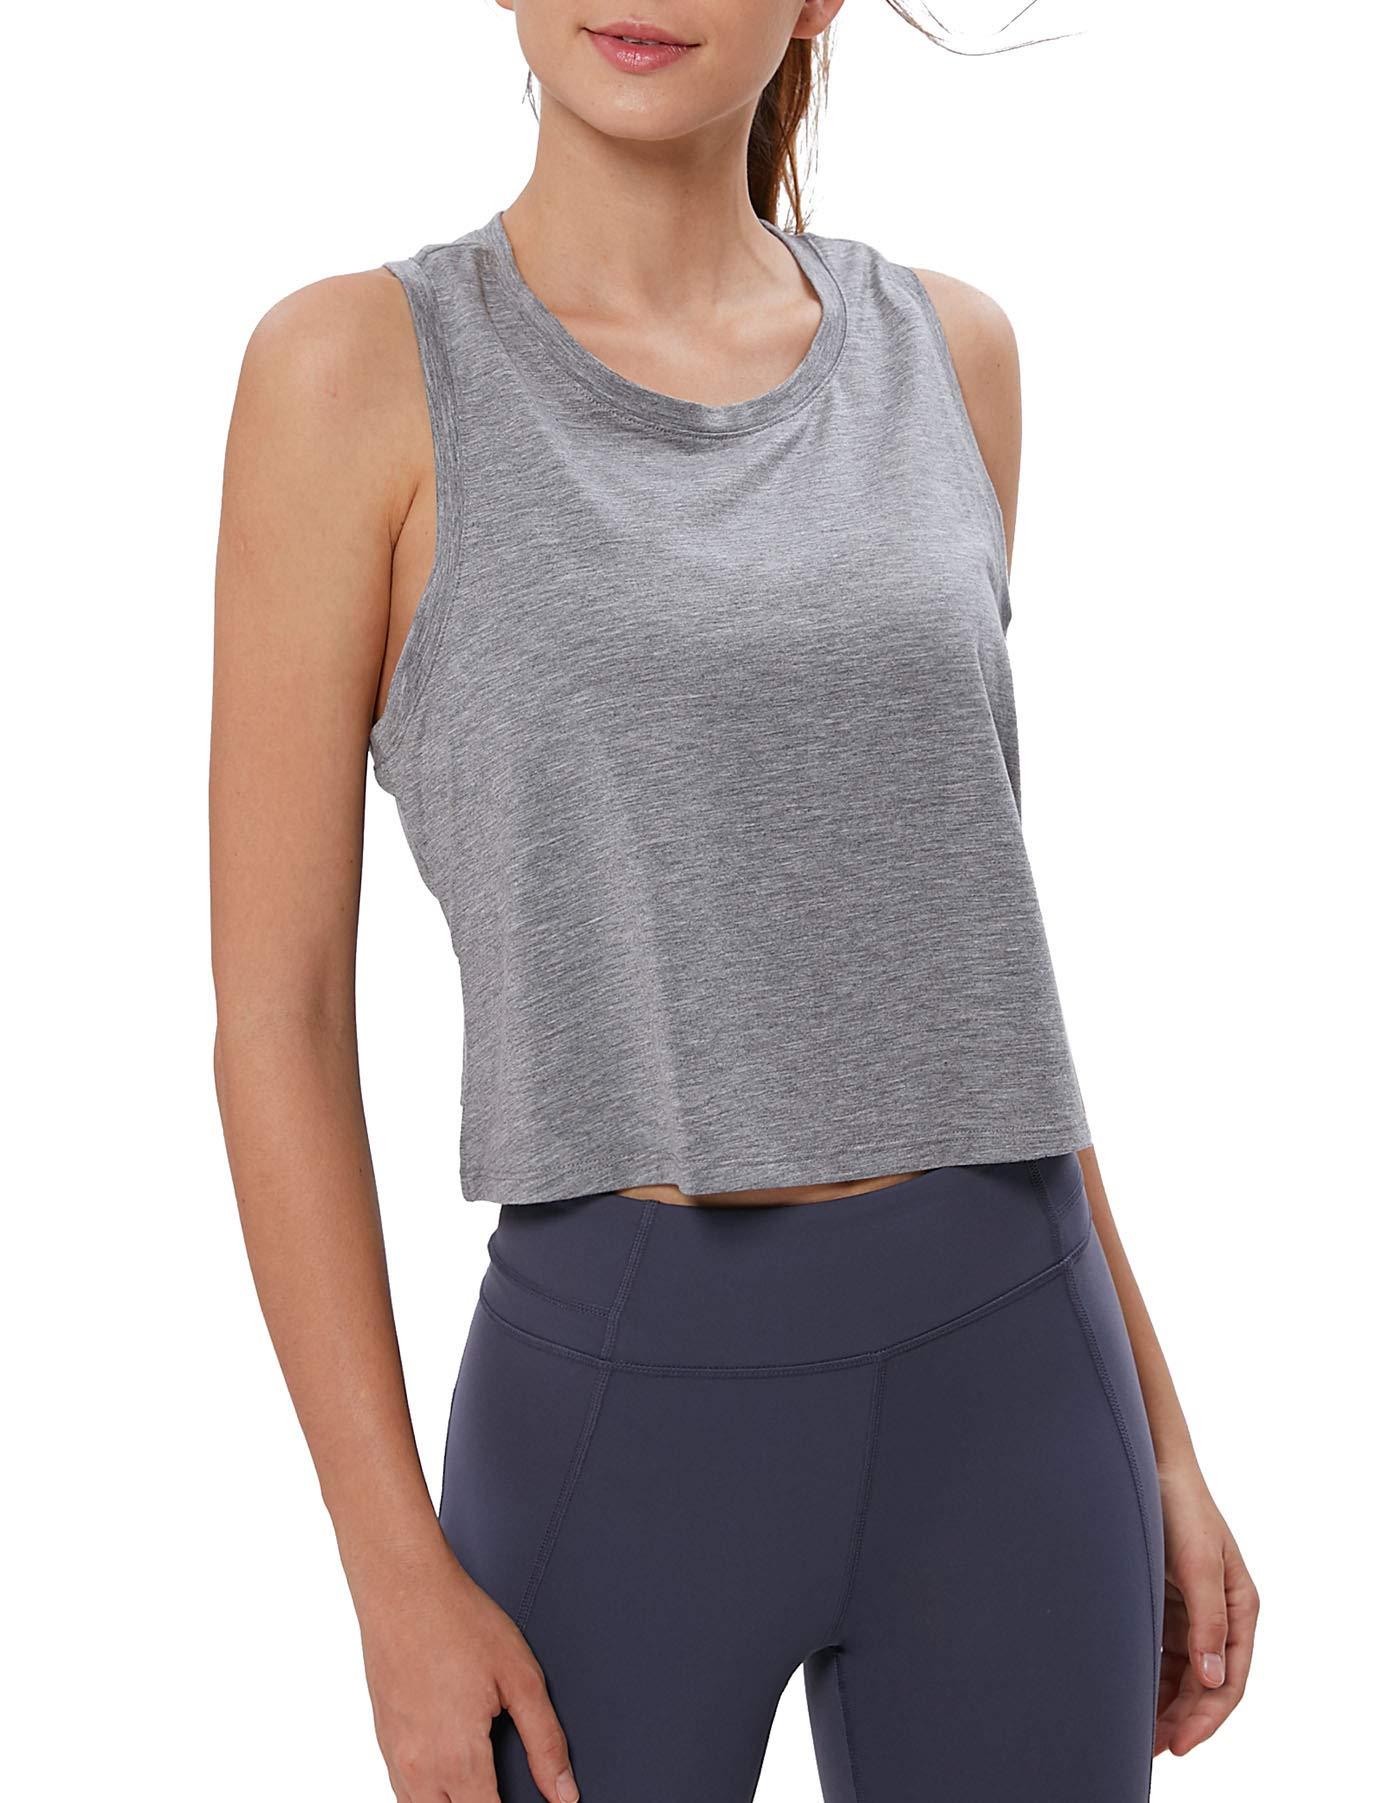 Women Workout Tank Top Loose Fit Under Belly Button Racerback Muscle Crop Tanks for Teenage Girls Xinsilu